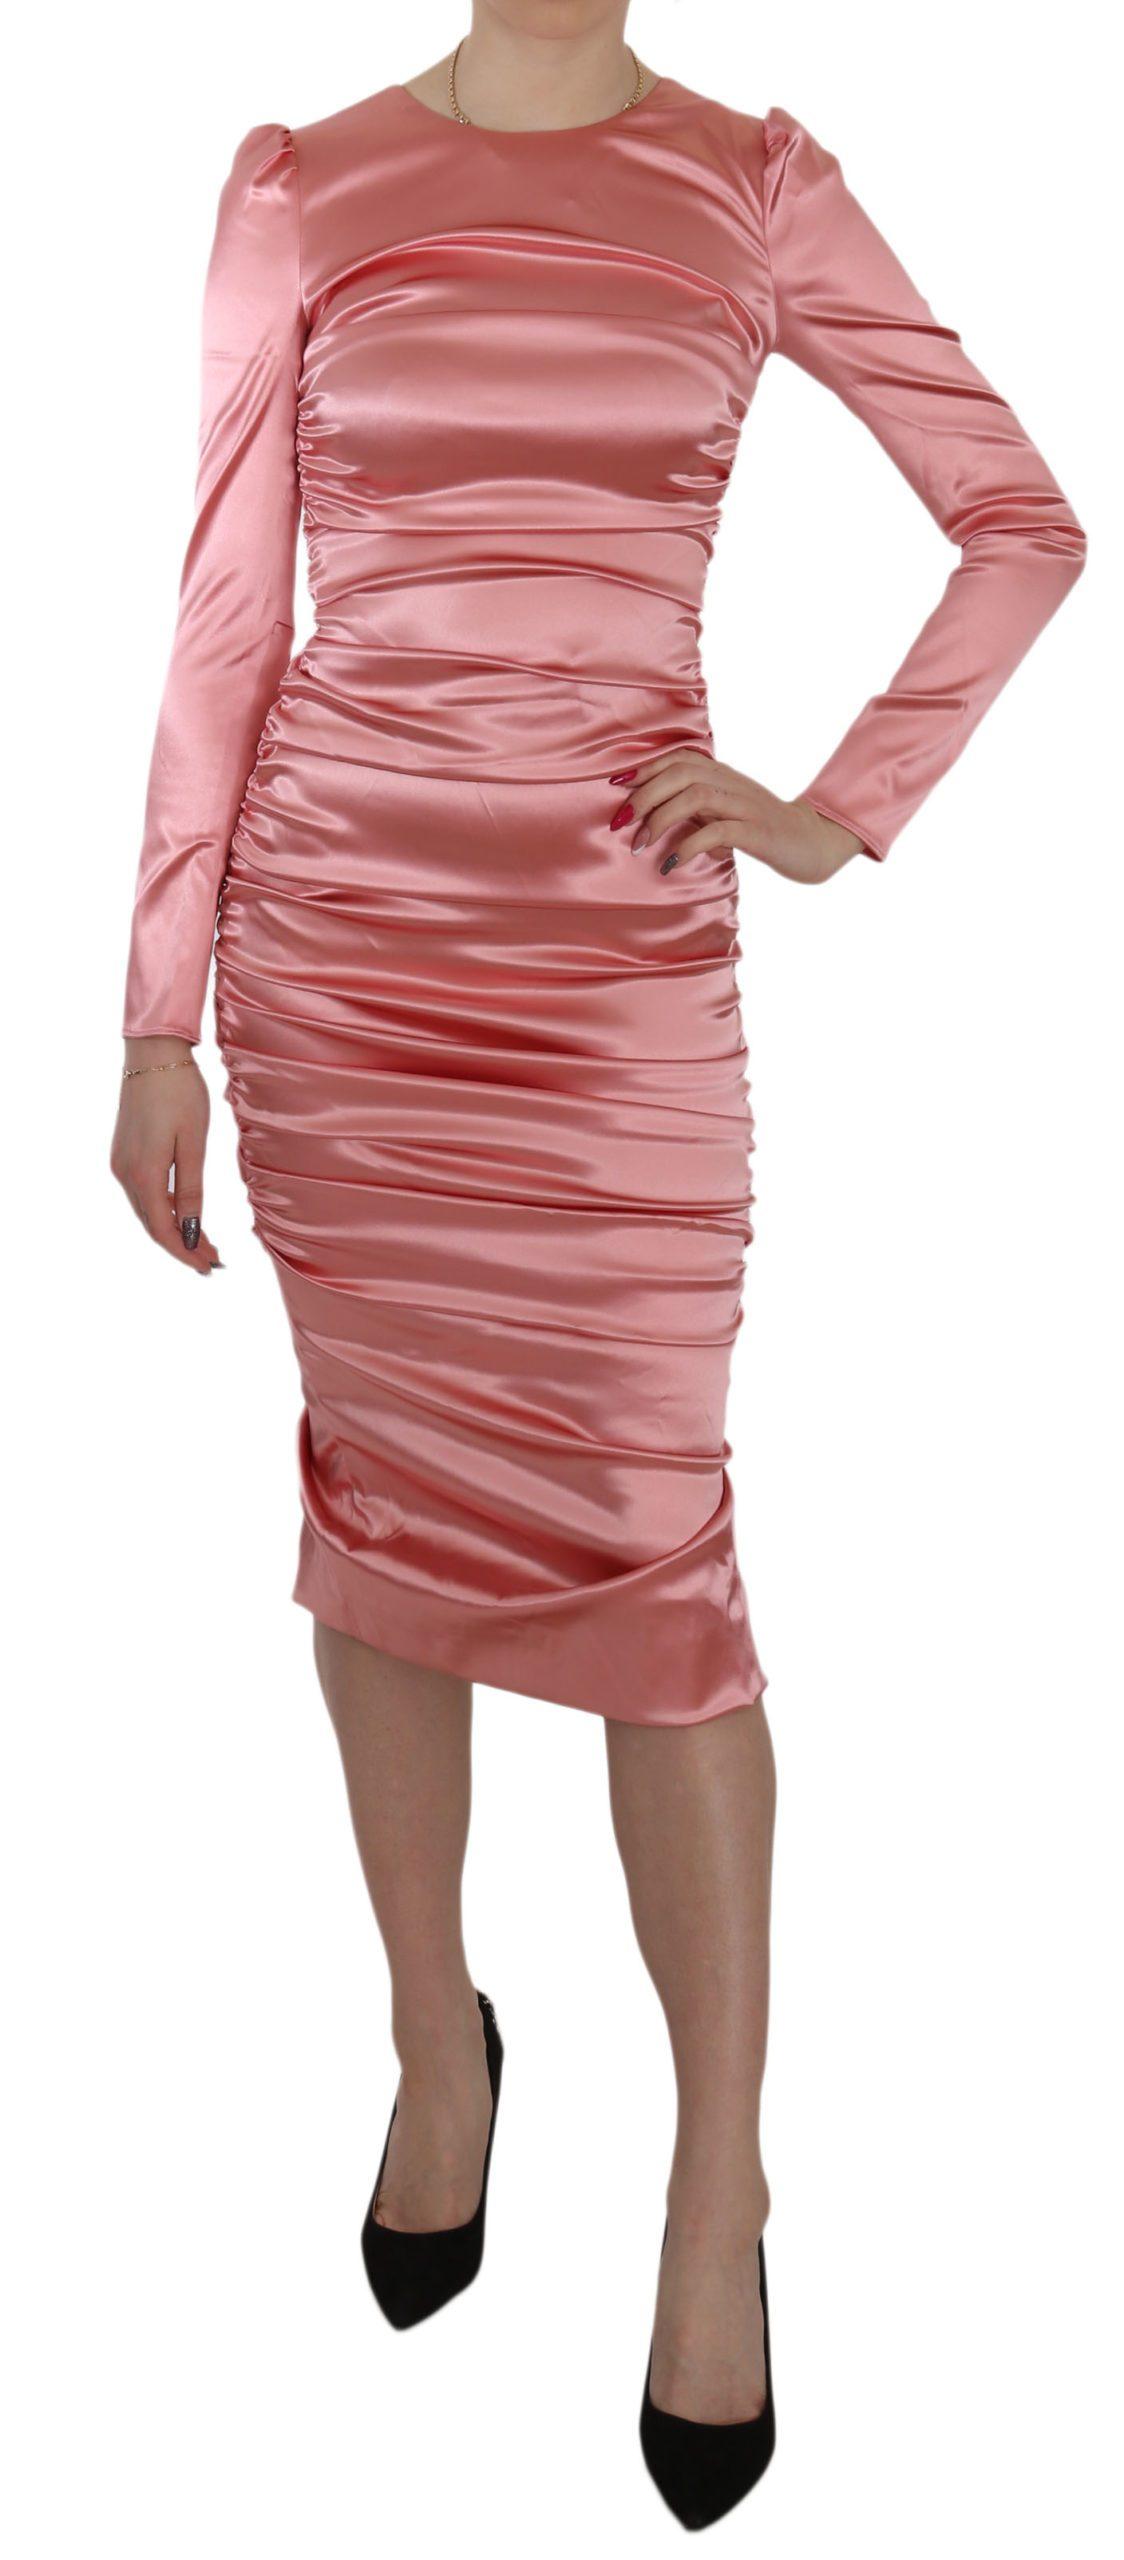 Dolce & Gabbana Women's LS Bodycon Sheath Dress Pink DR1936 - IT38|XS